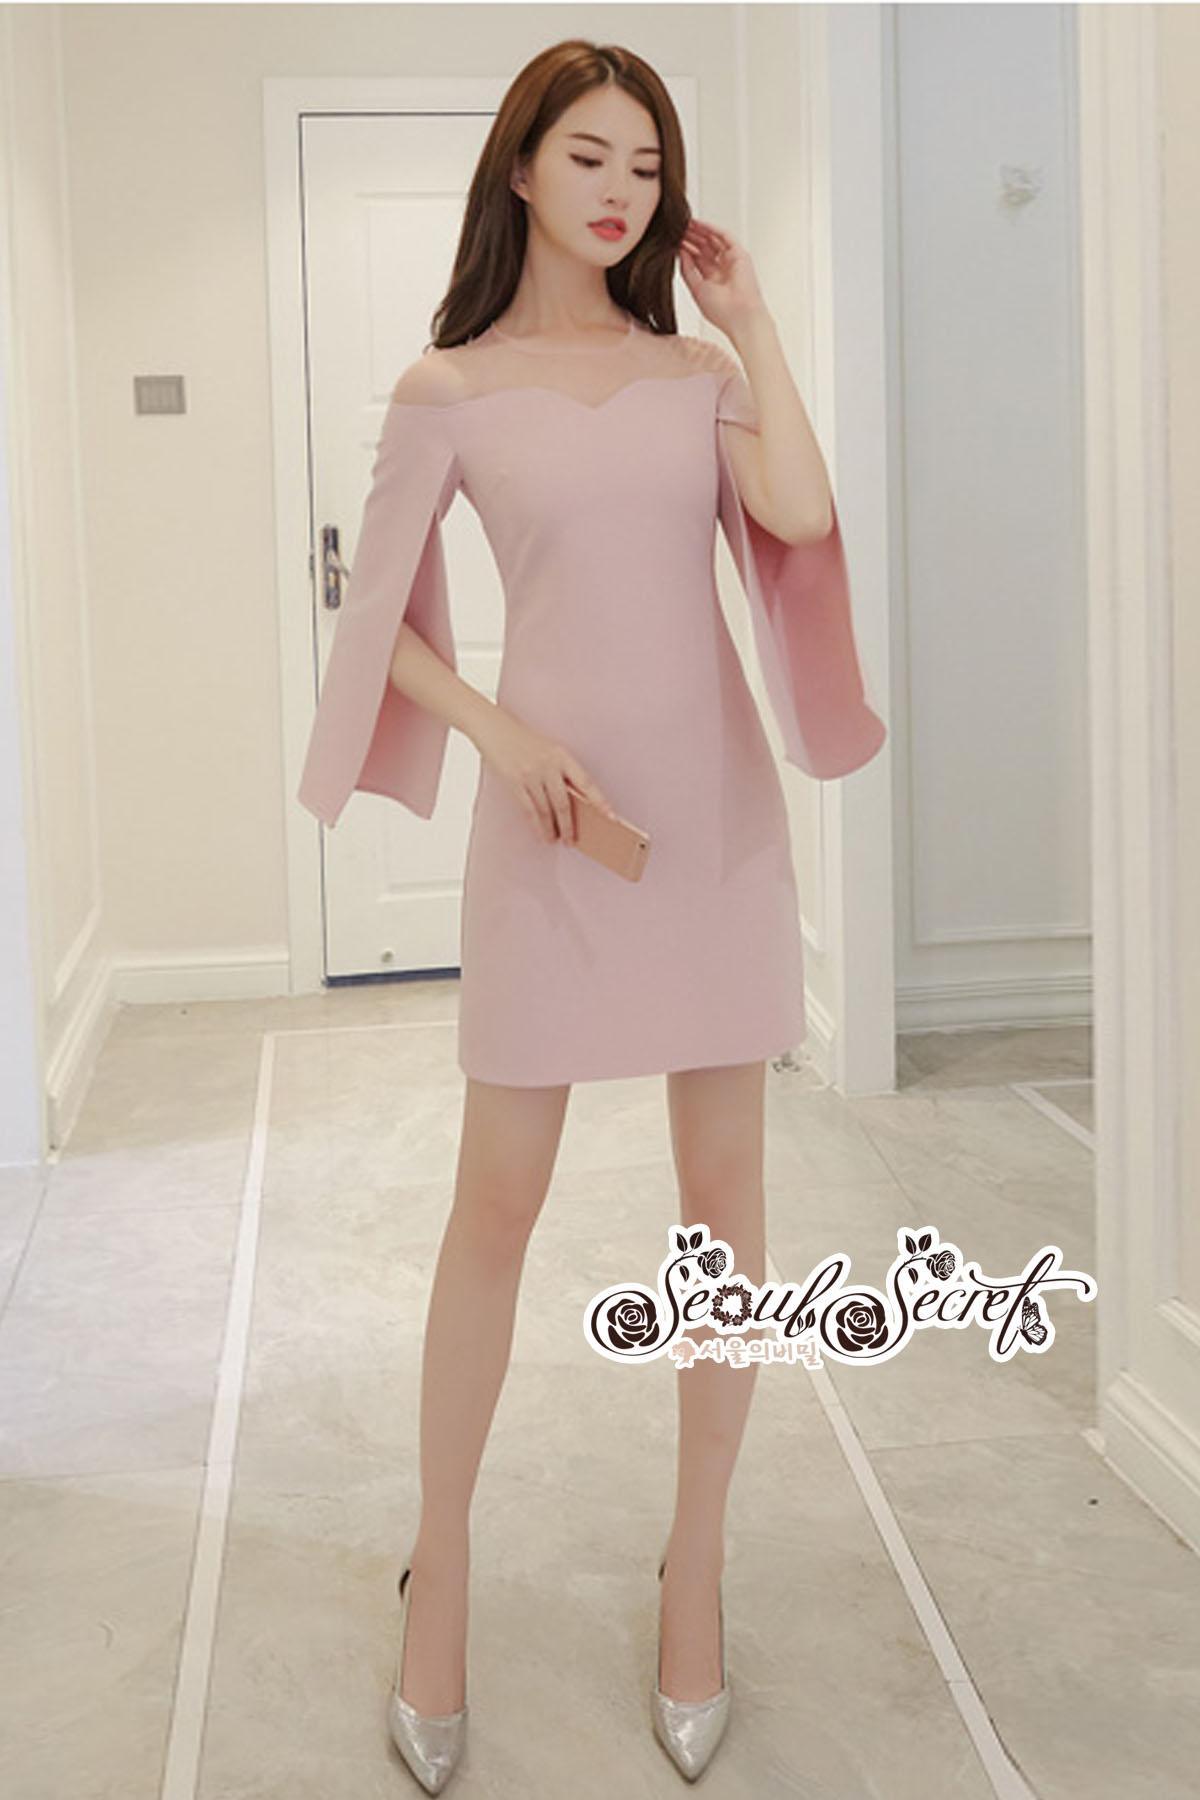 Minidress Light Pink Long Sleeve Chic Chic Dress